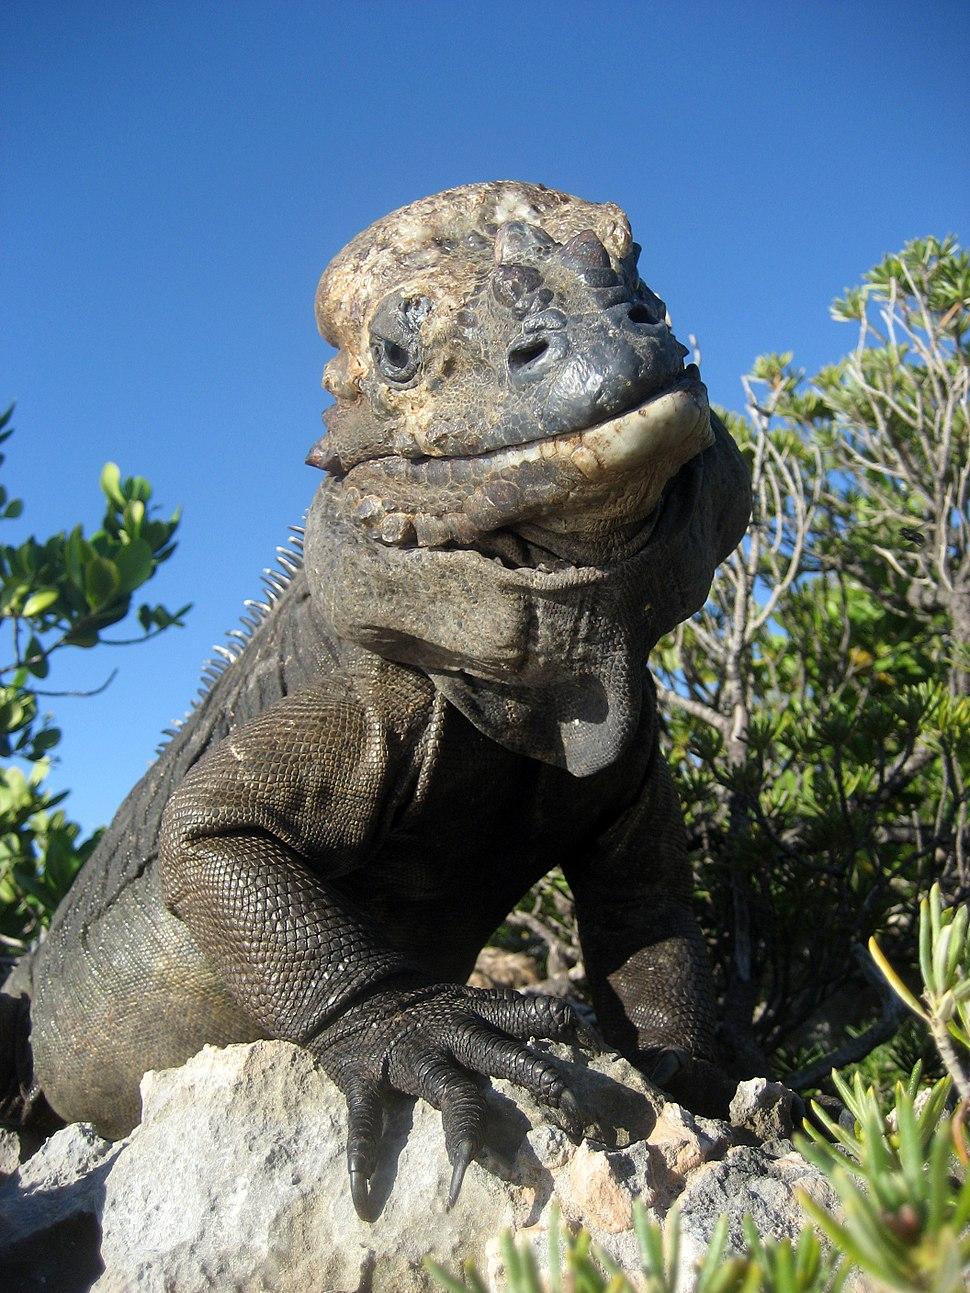 Mona ground iguana no.2